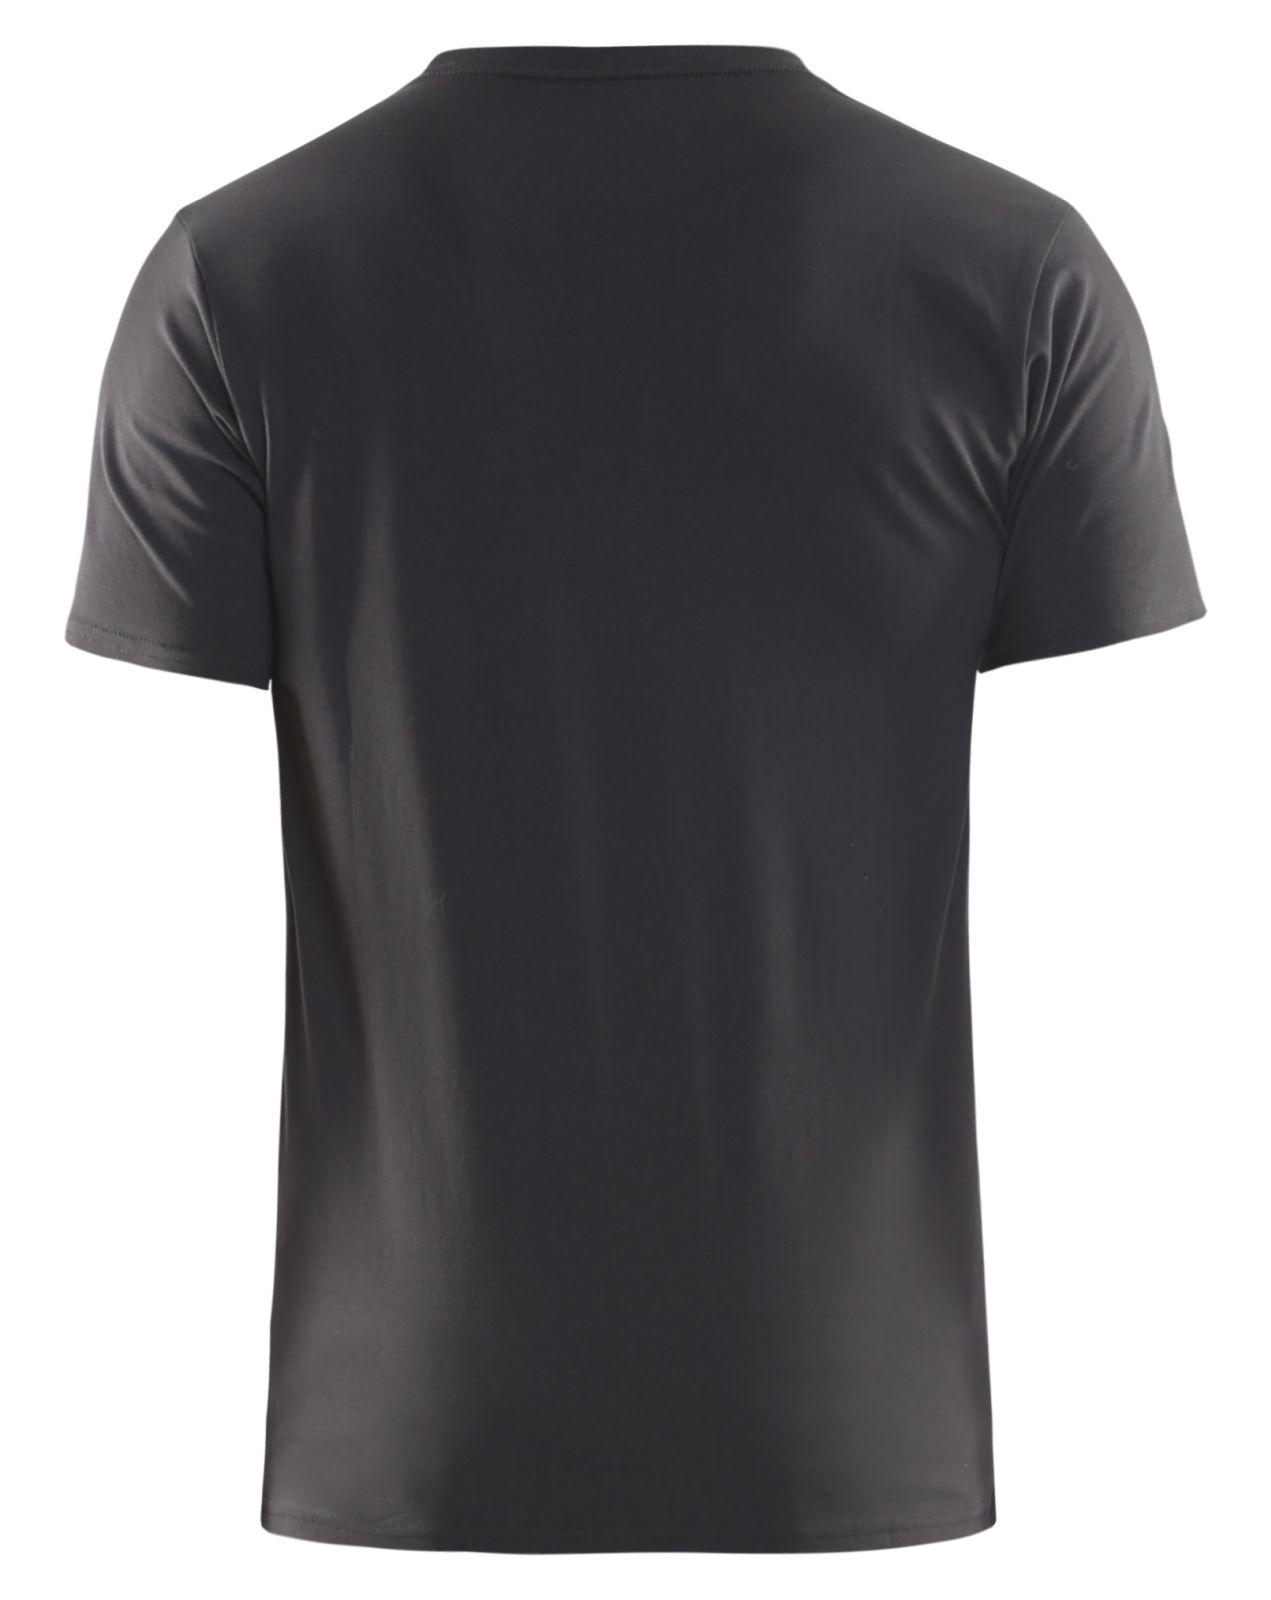 Blaklader T-shirts 35331029 donkergrijs(9800)